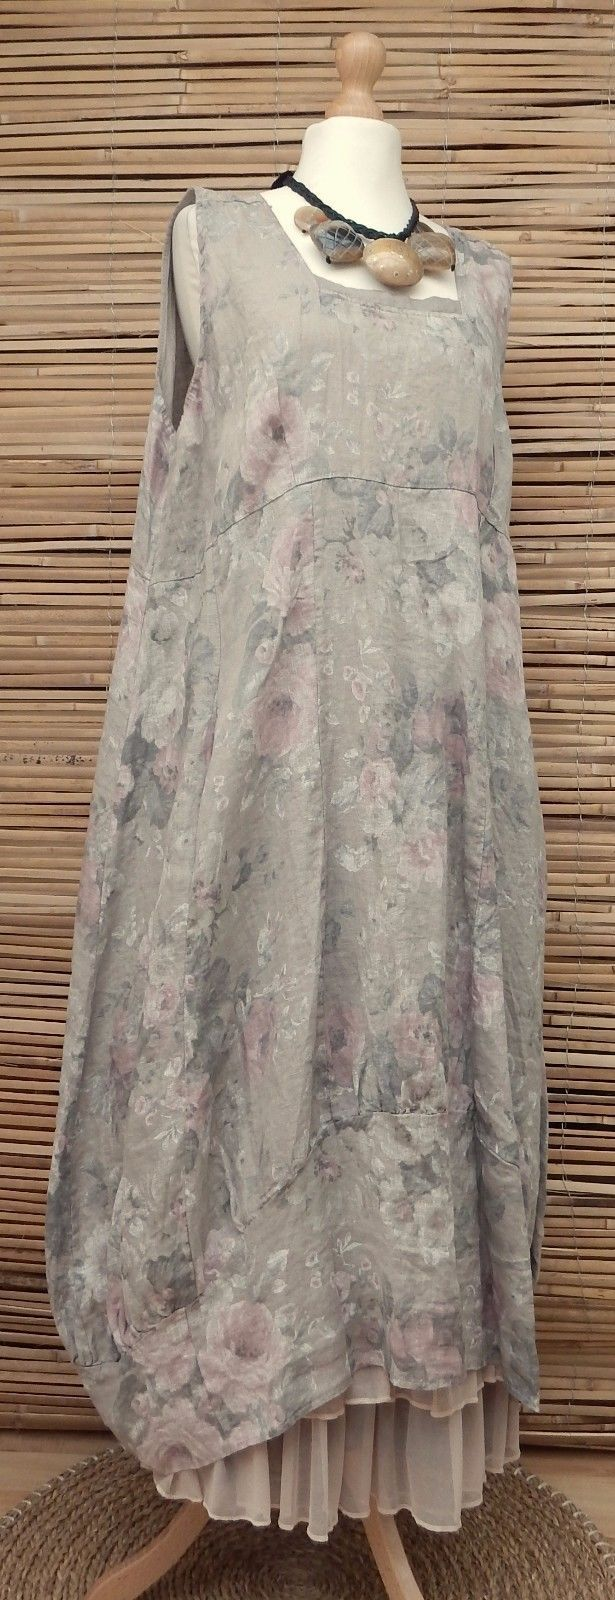 LAGENLOOK LINEN OVERSIZED FLORAL 2 POCKETS LONG DRESS**BEIGE** XL-XXL BUST 52-54 | eBay